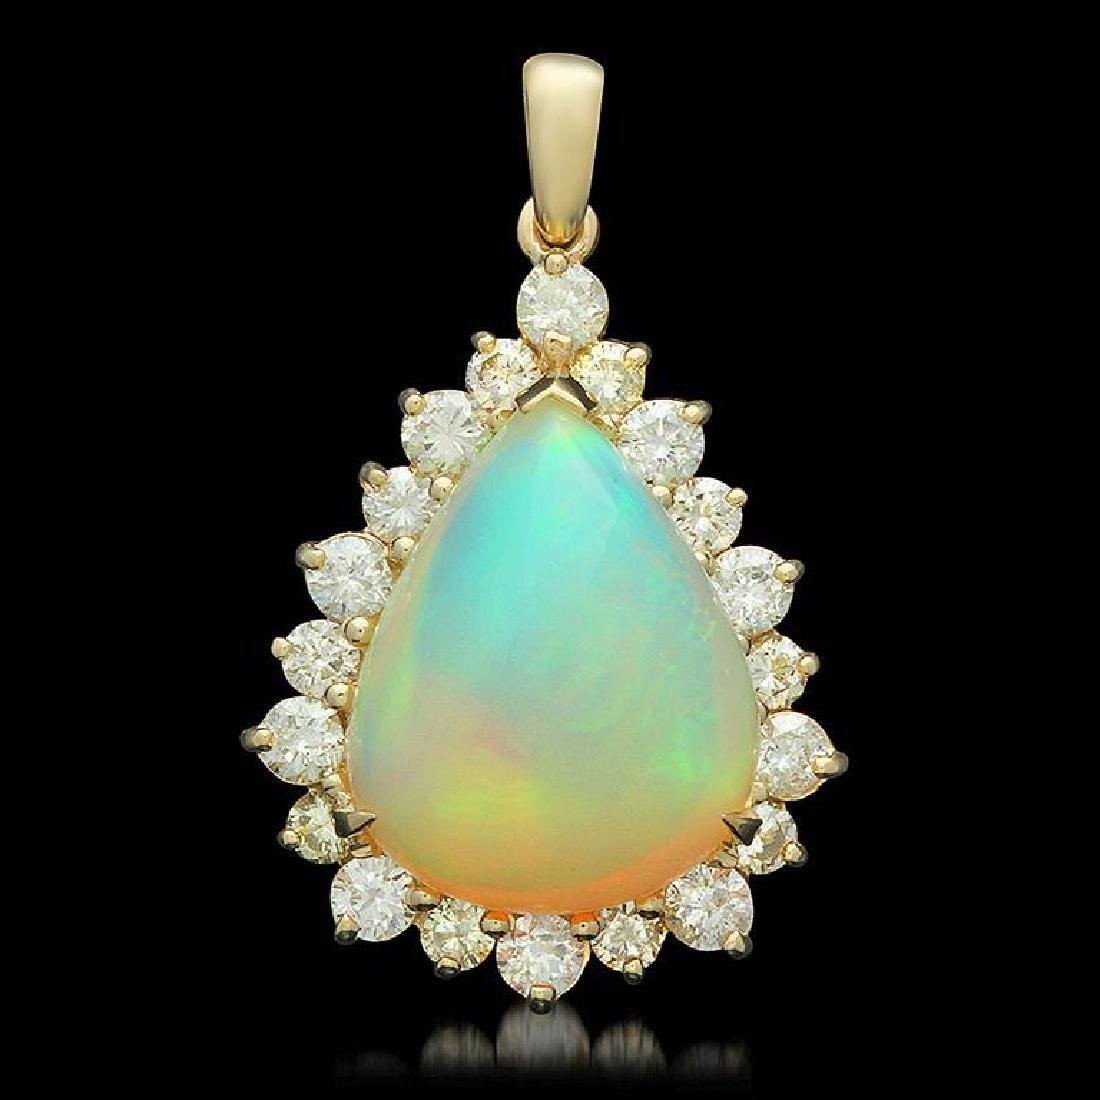 14K Gold 10.78ct Opal 2.15ct Diamond Pendant